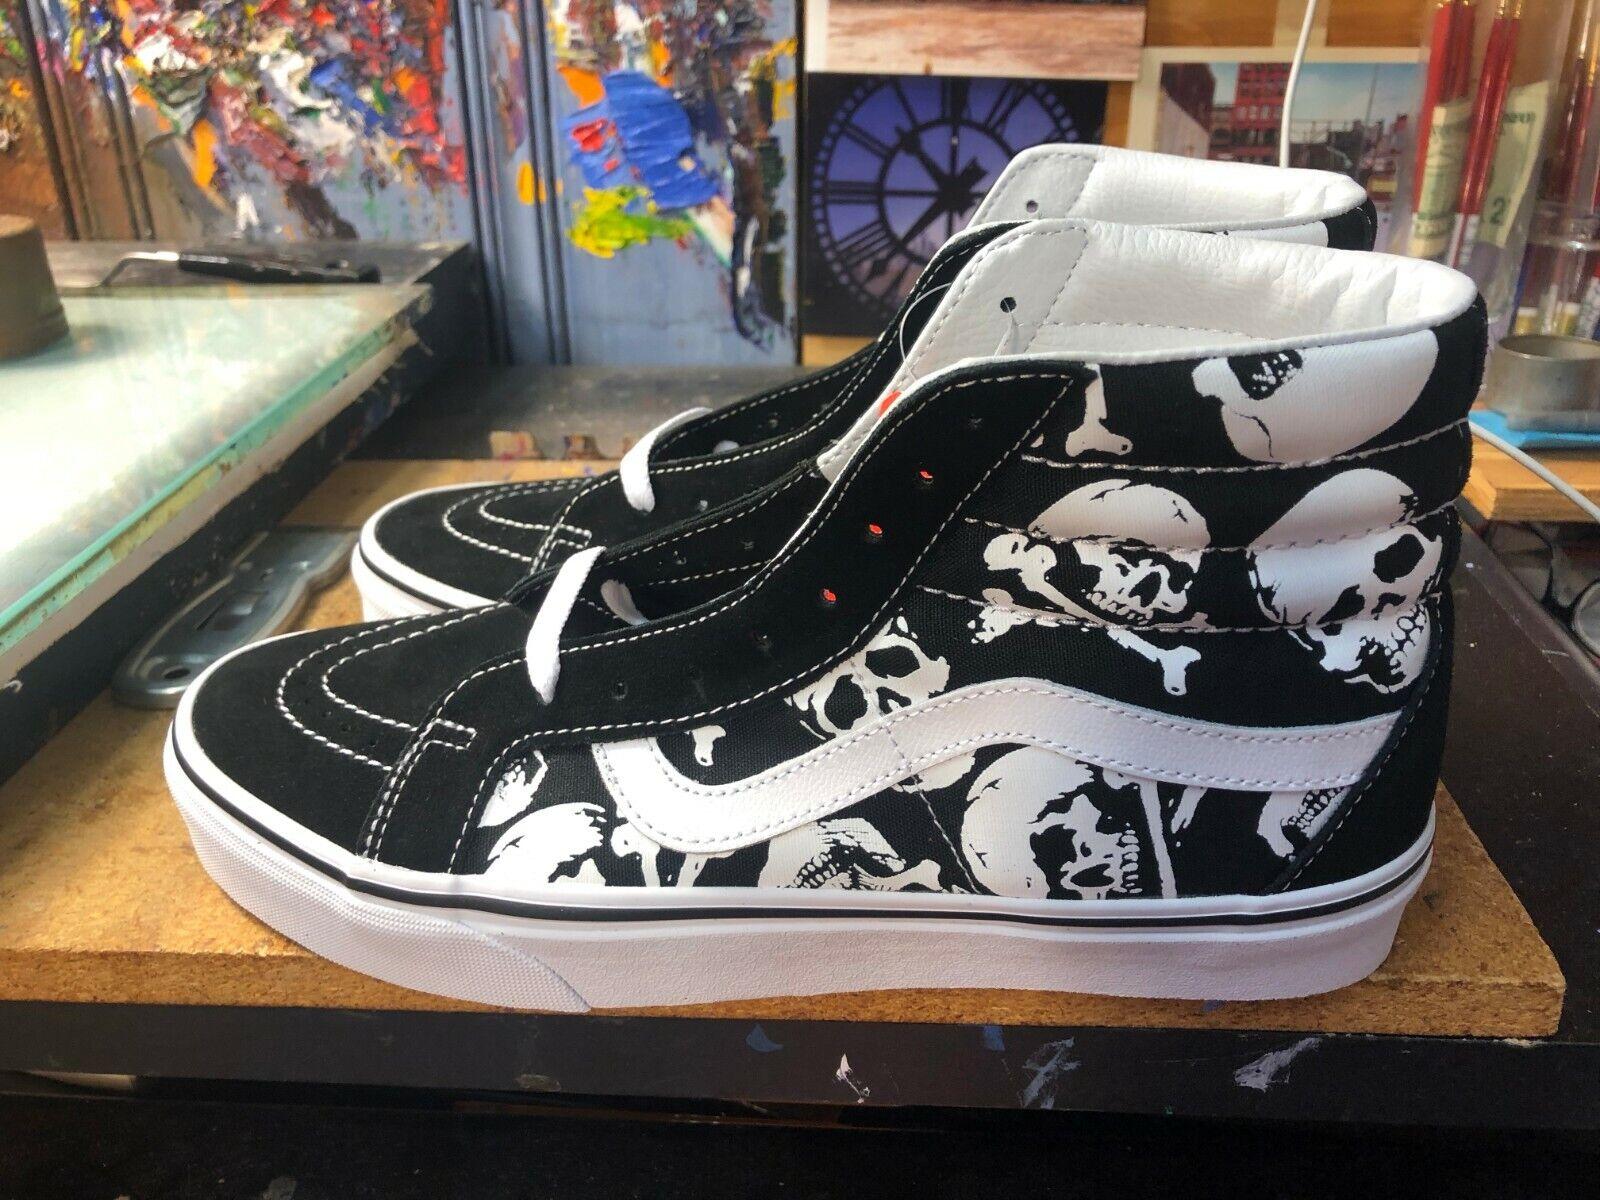 Vans Sk8-Hi Reissue Skulls Black White Suede Canvas US 10 Men's VN0A2XSBH0B New